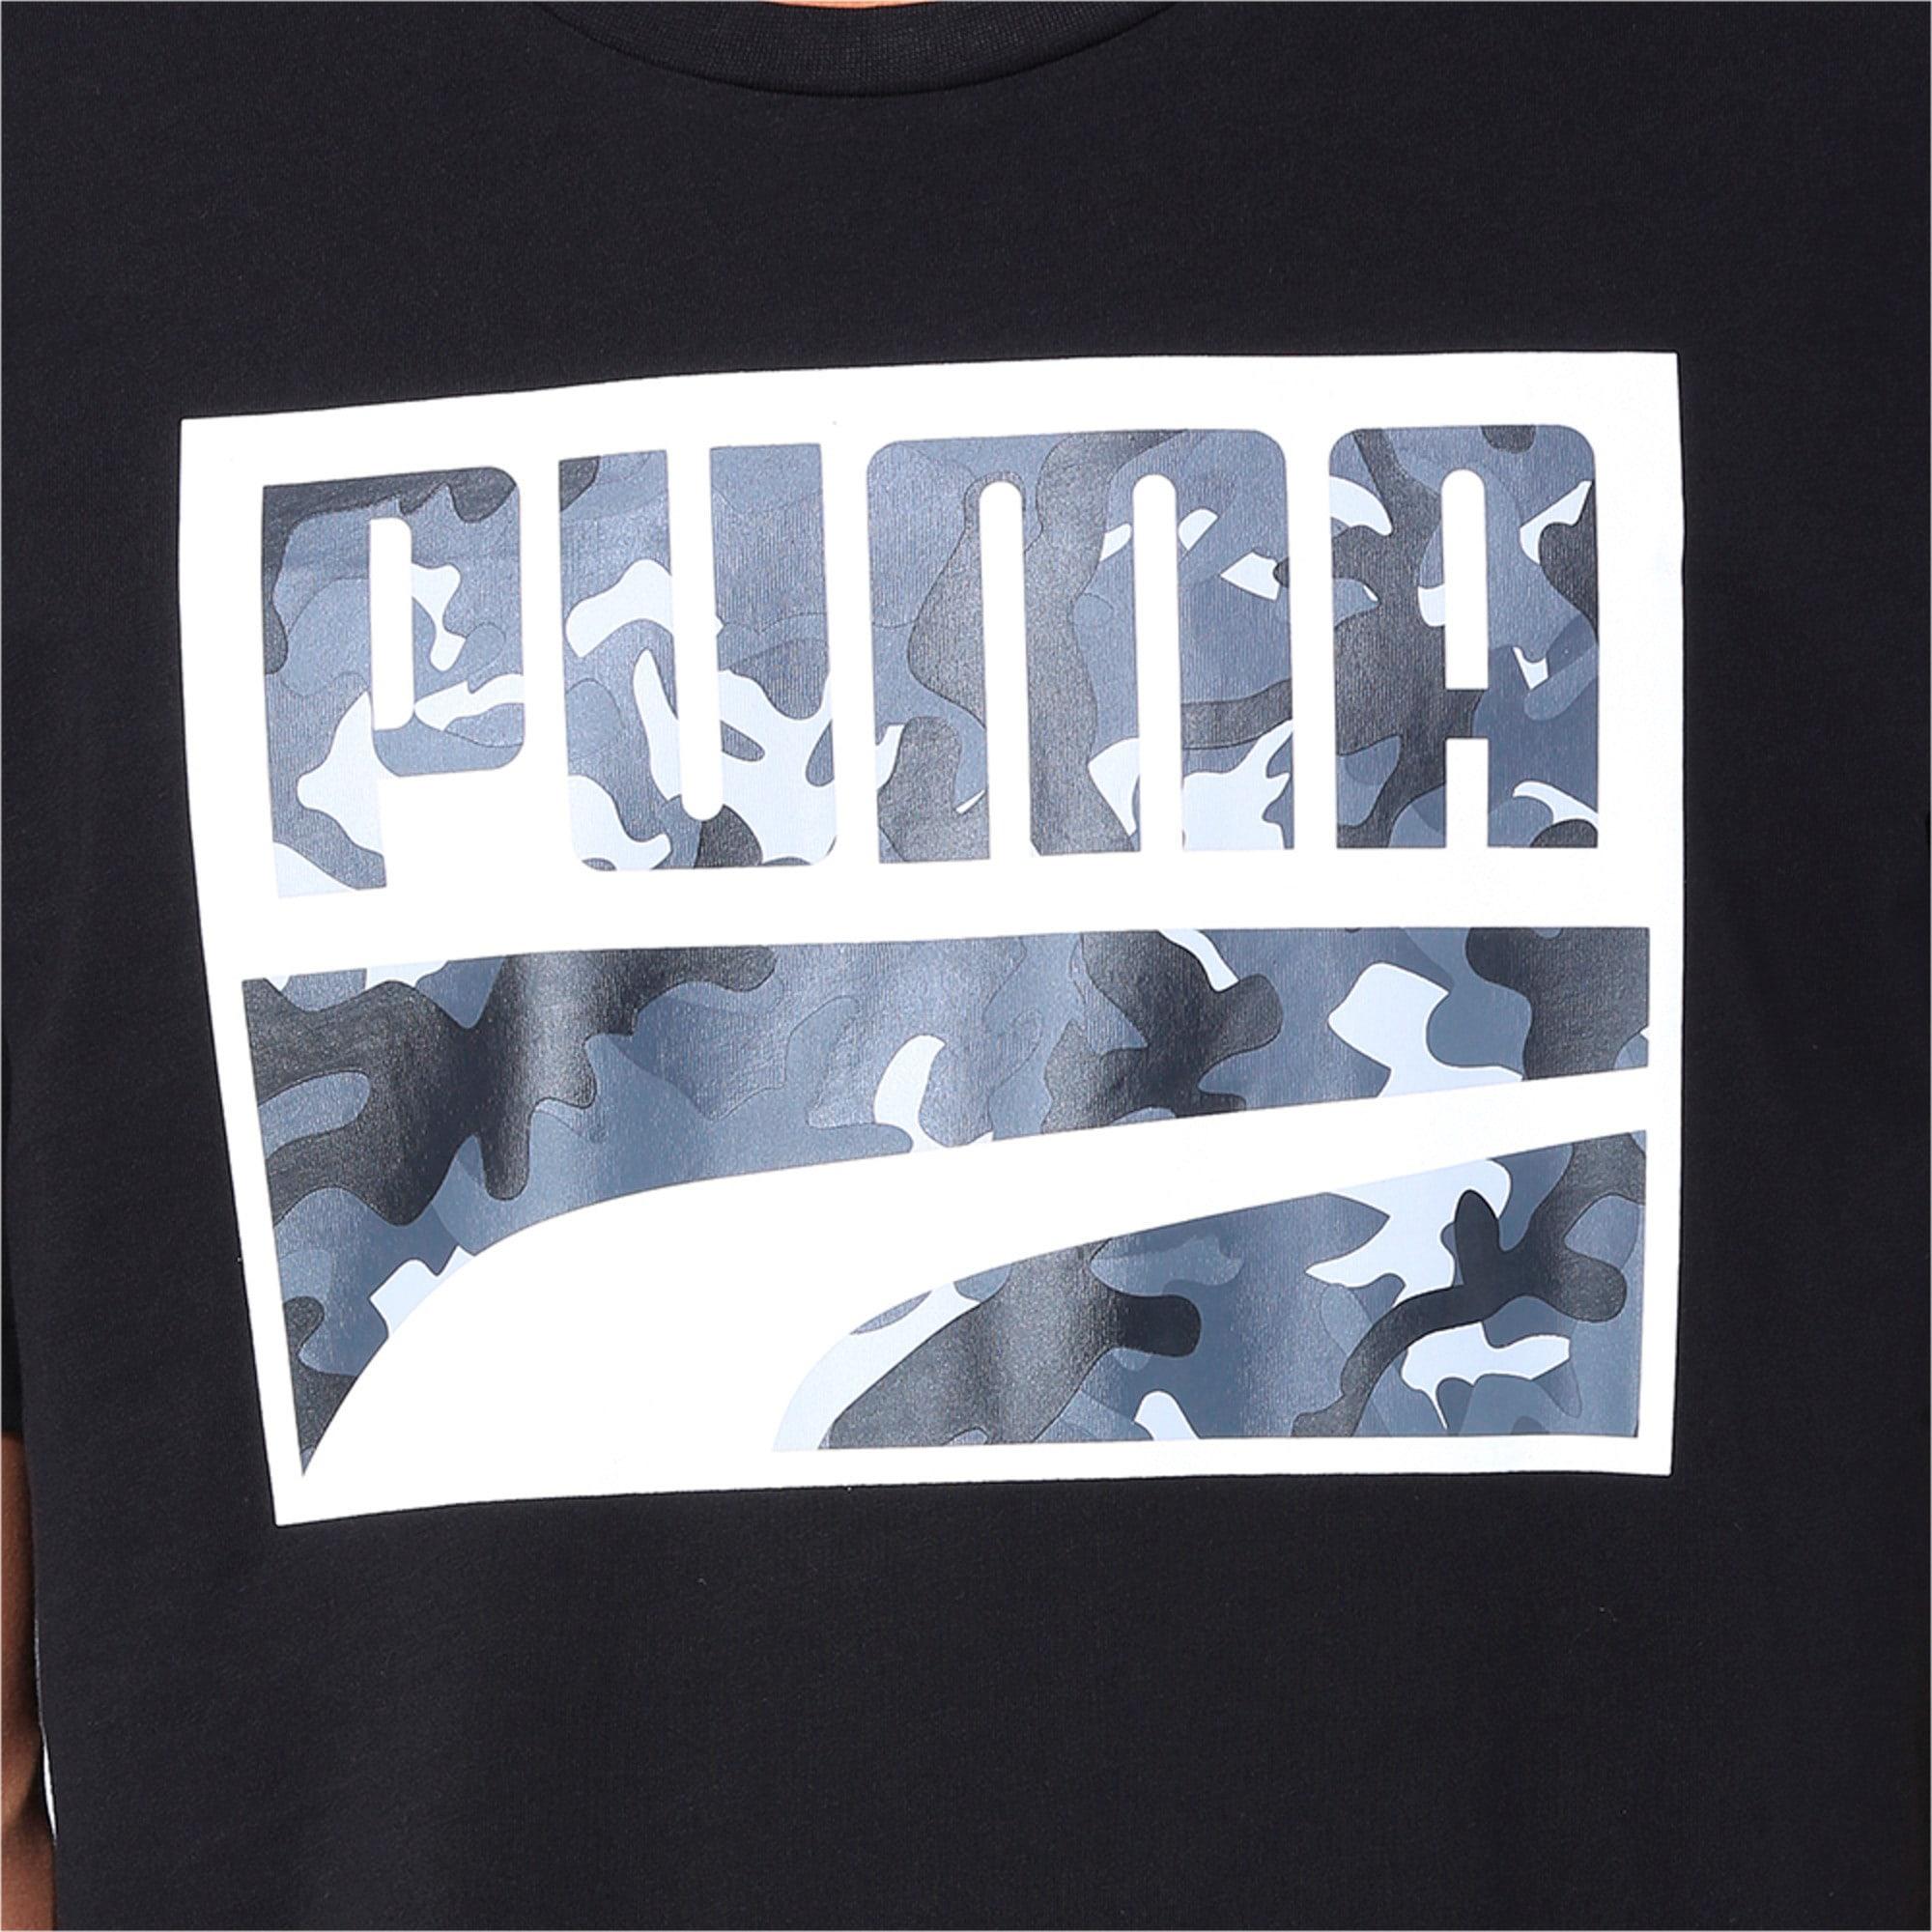 Thumbnail 6 of Rebel Camo Filled Men's Tee, Puma Black, medium-IND